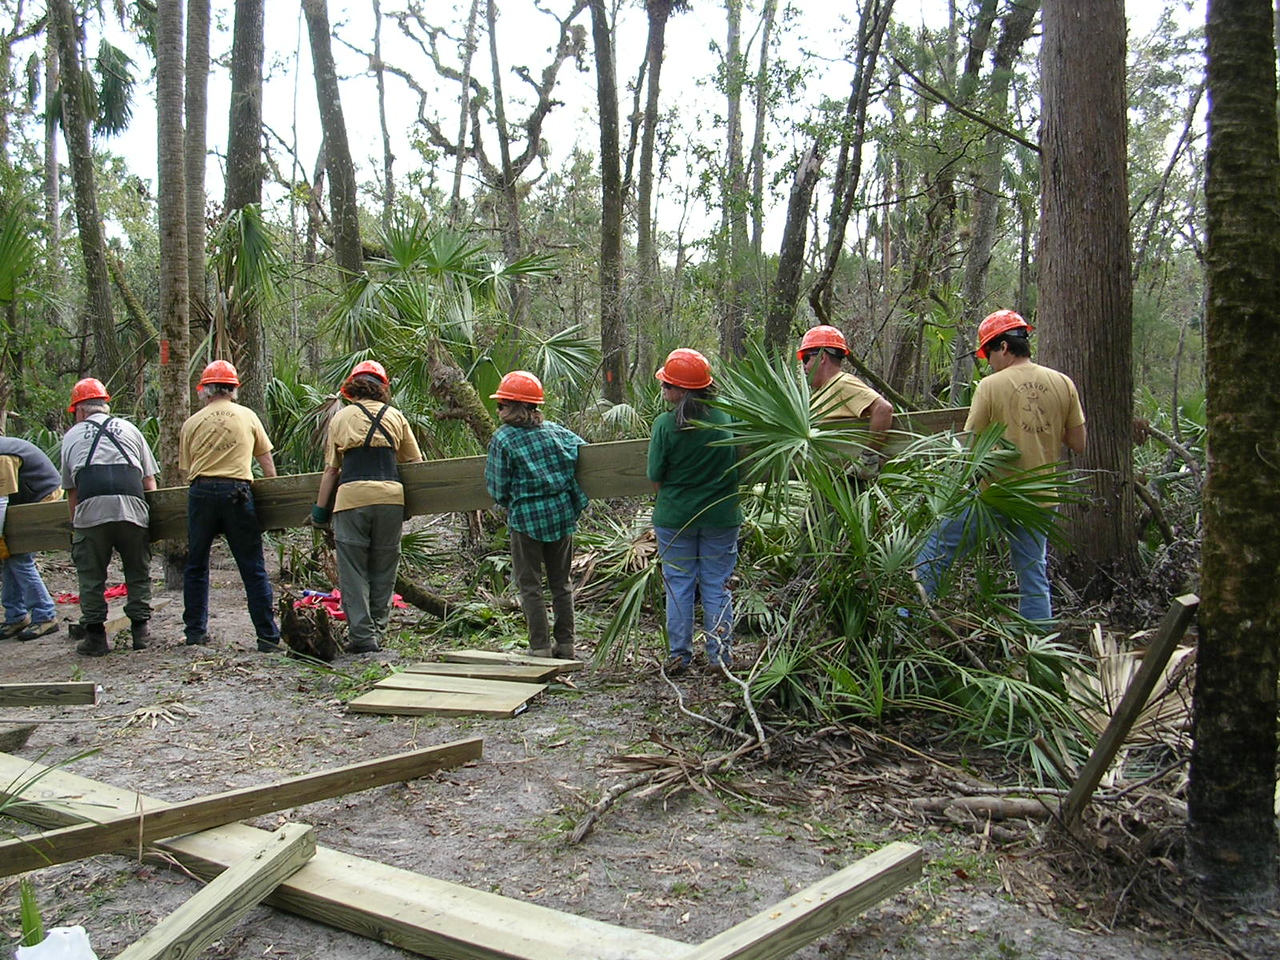 It takes teamwork: F-Troop at work<br /> PHOTO CREDIT: Roger Werner / Florida Trail Association